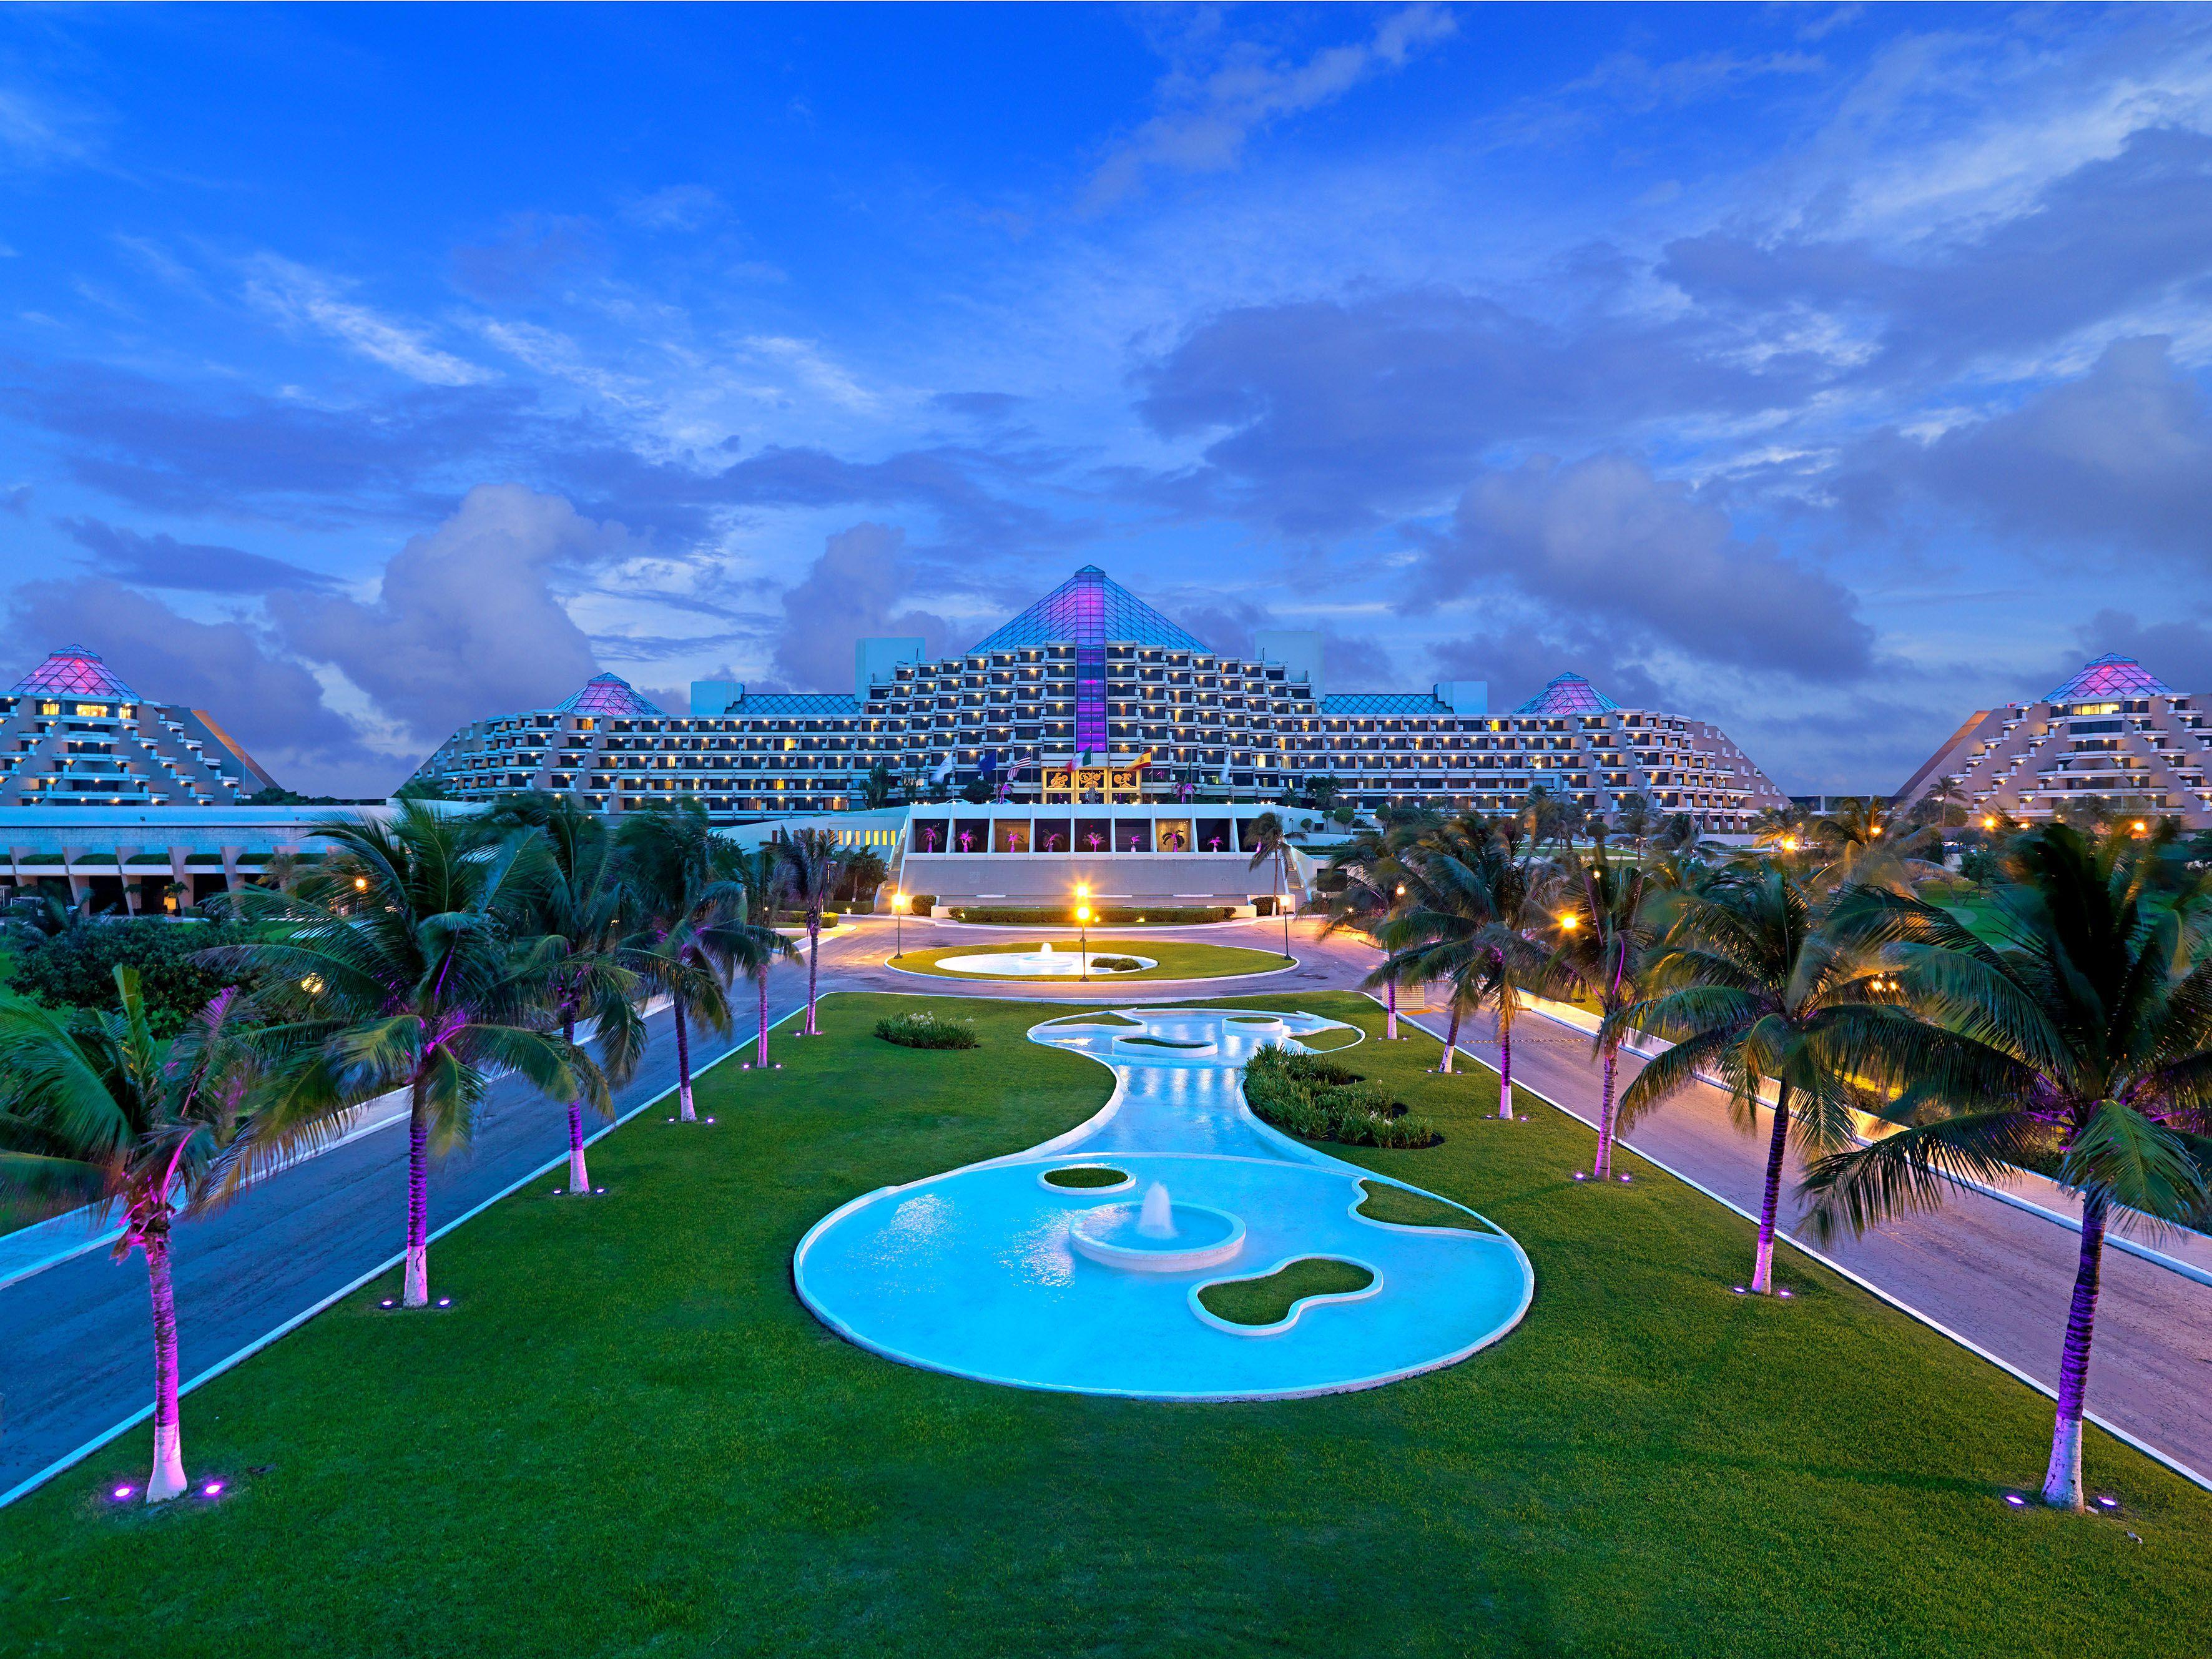 Family The Paradisus Cancun Hotel Romancetravel Follow Us On Instagram